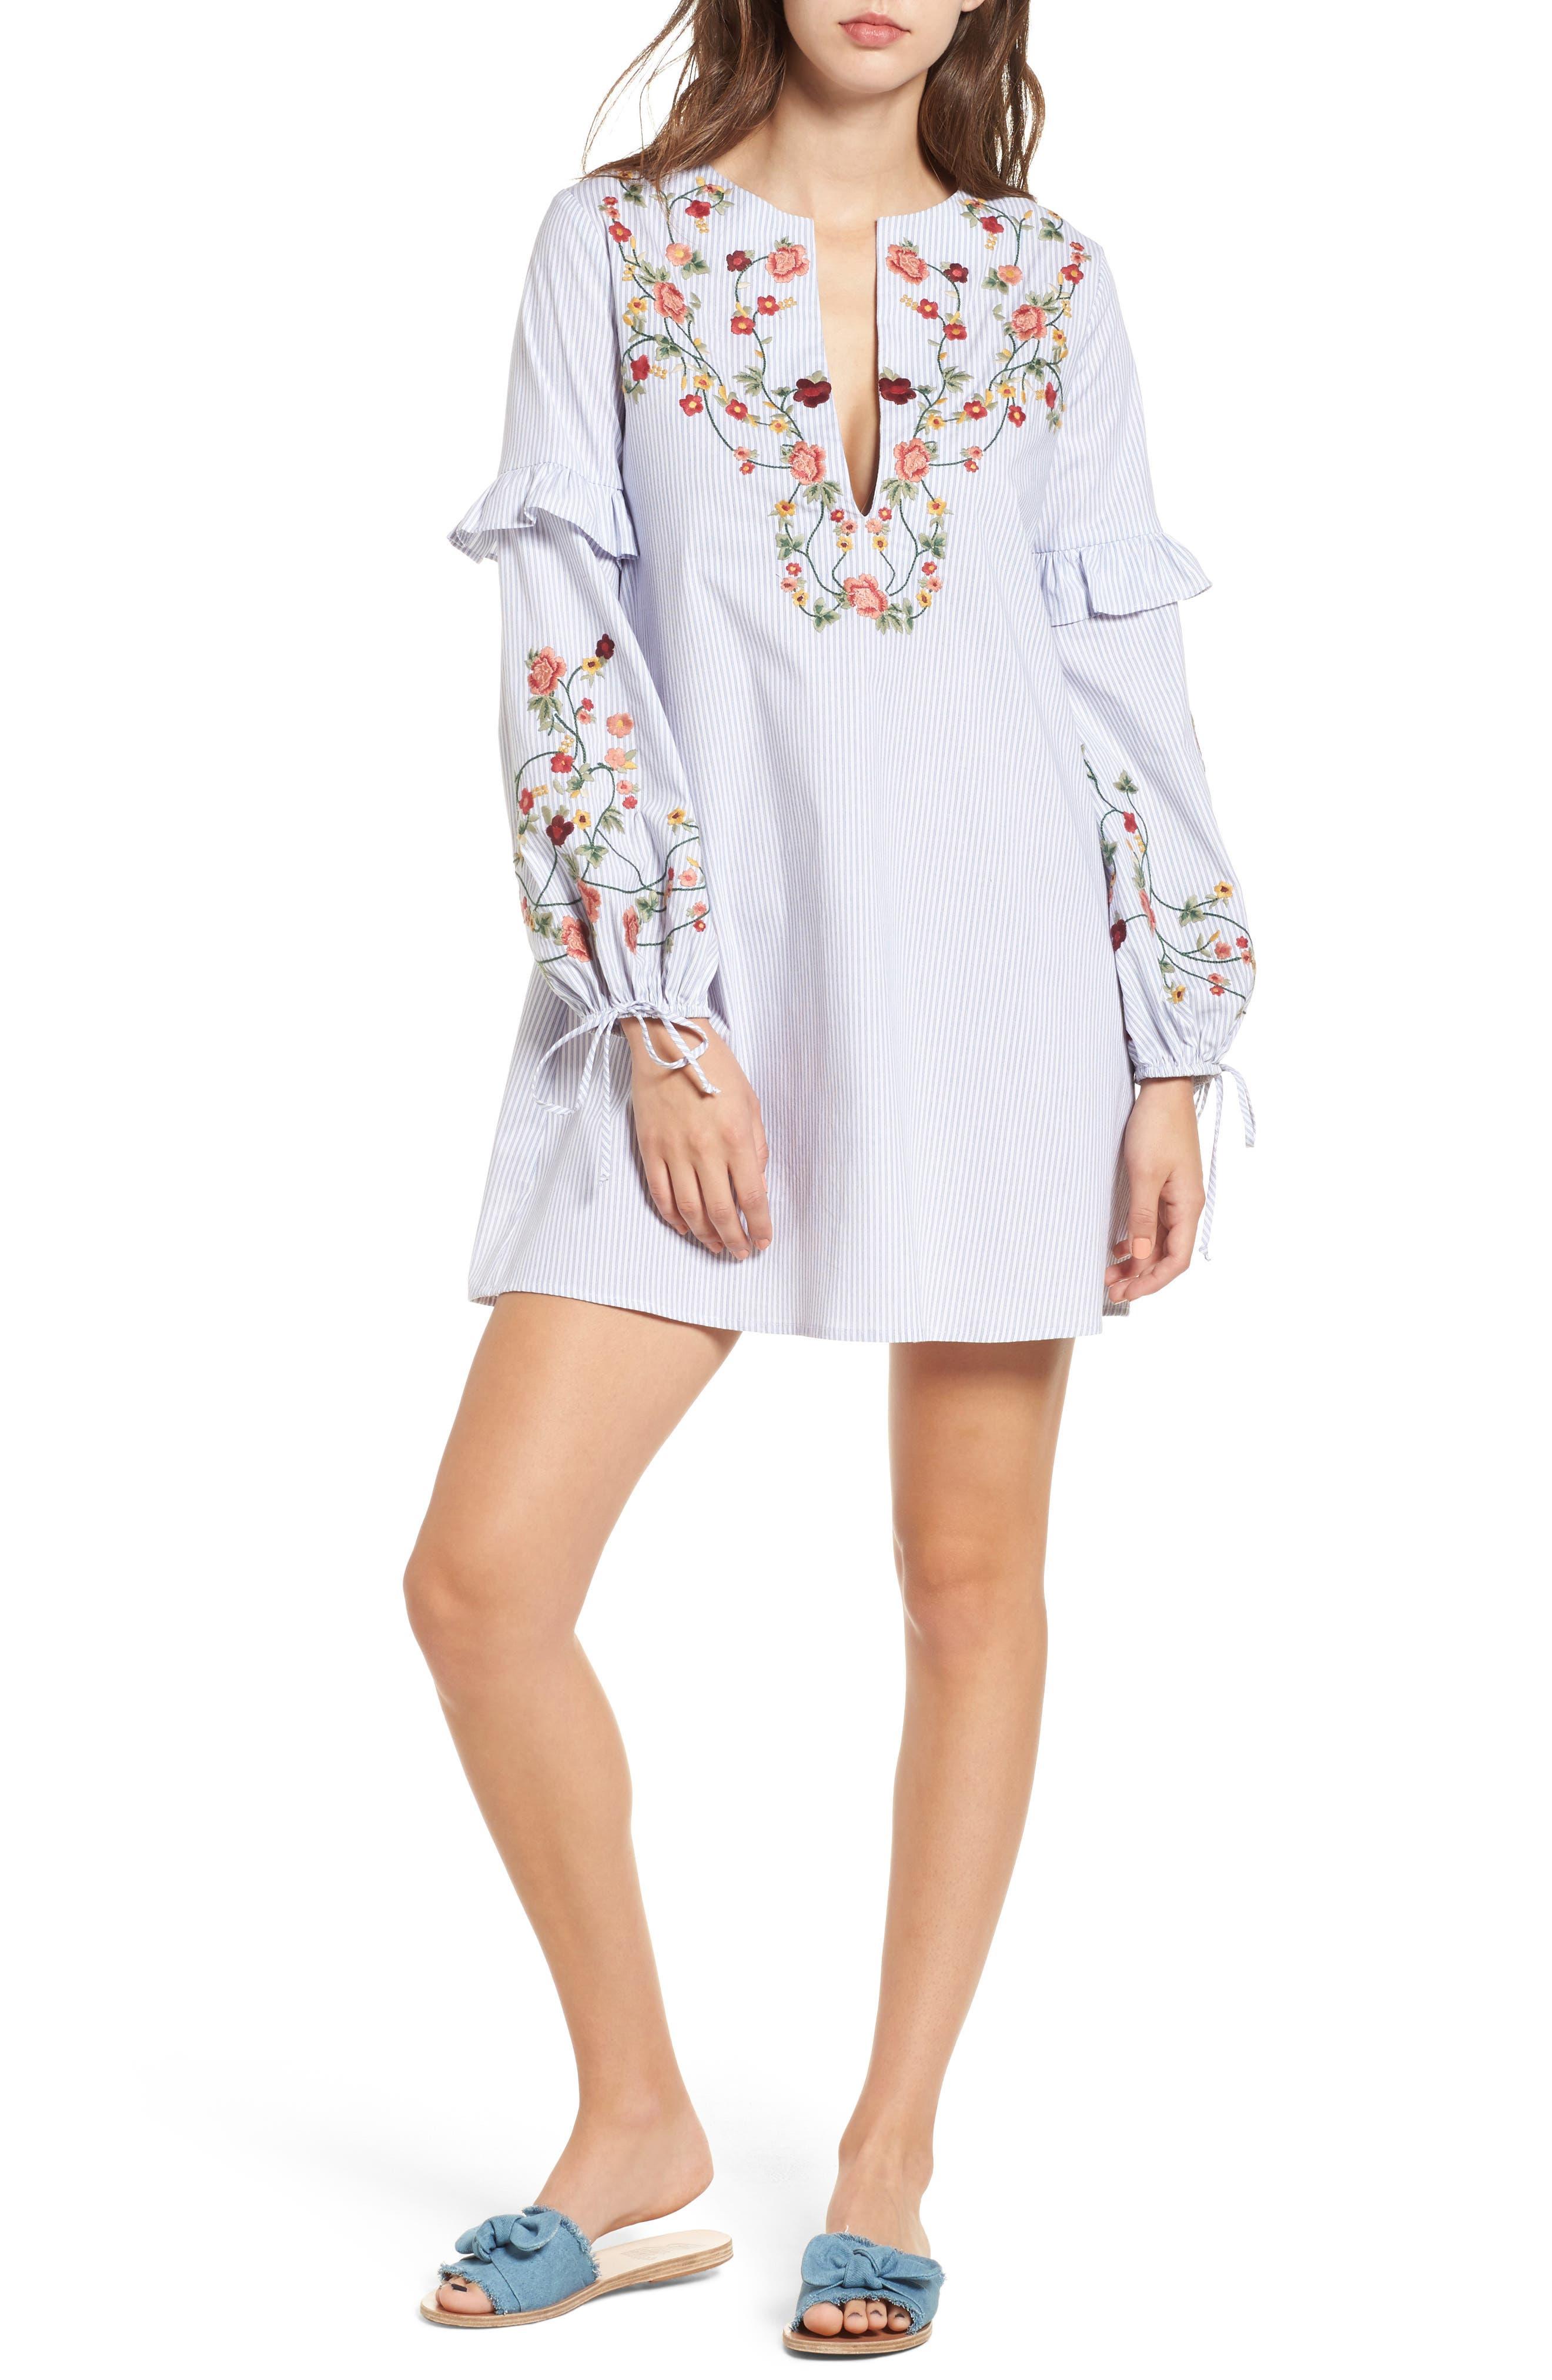 Socialite Embroidered Poplin Dress